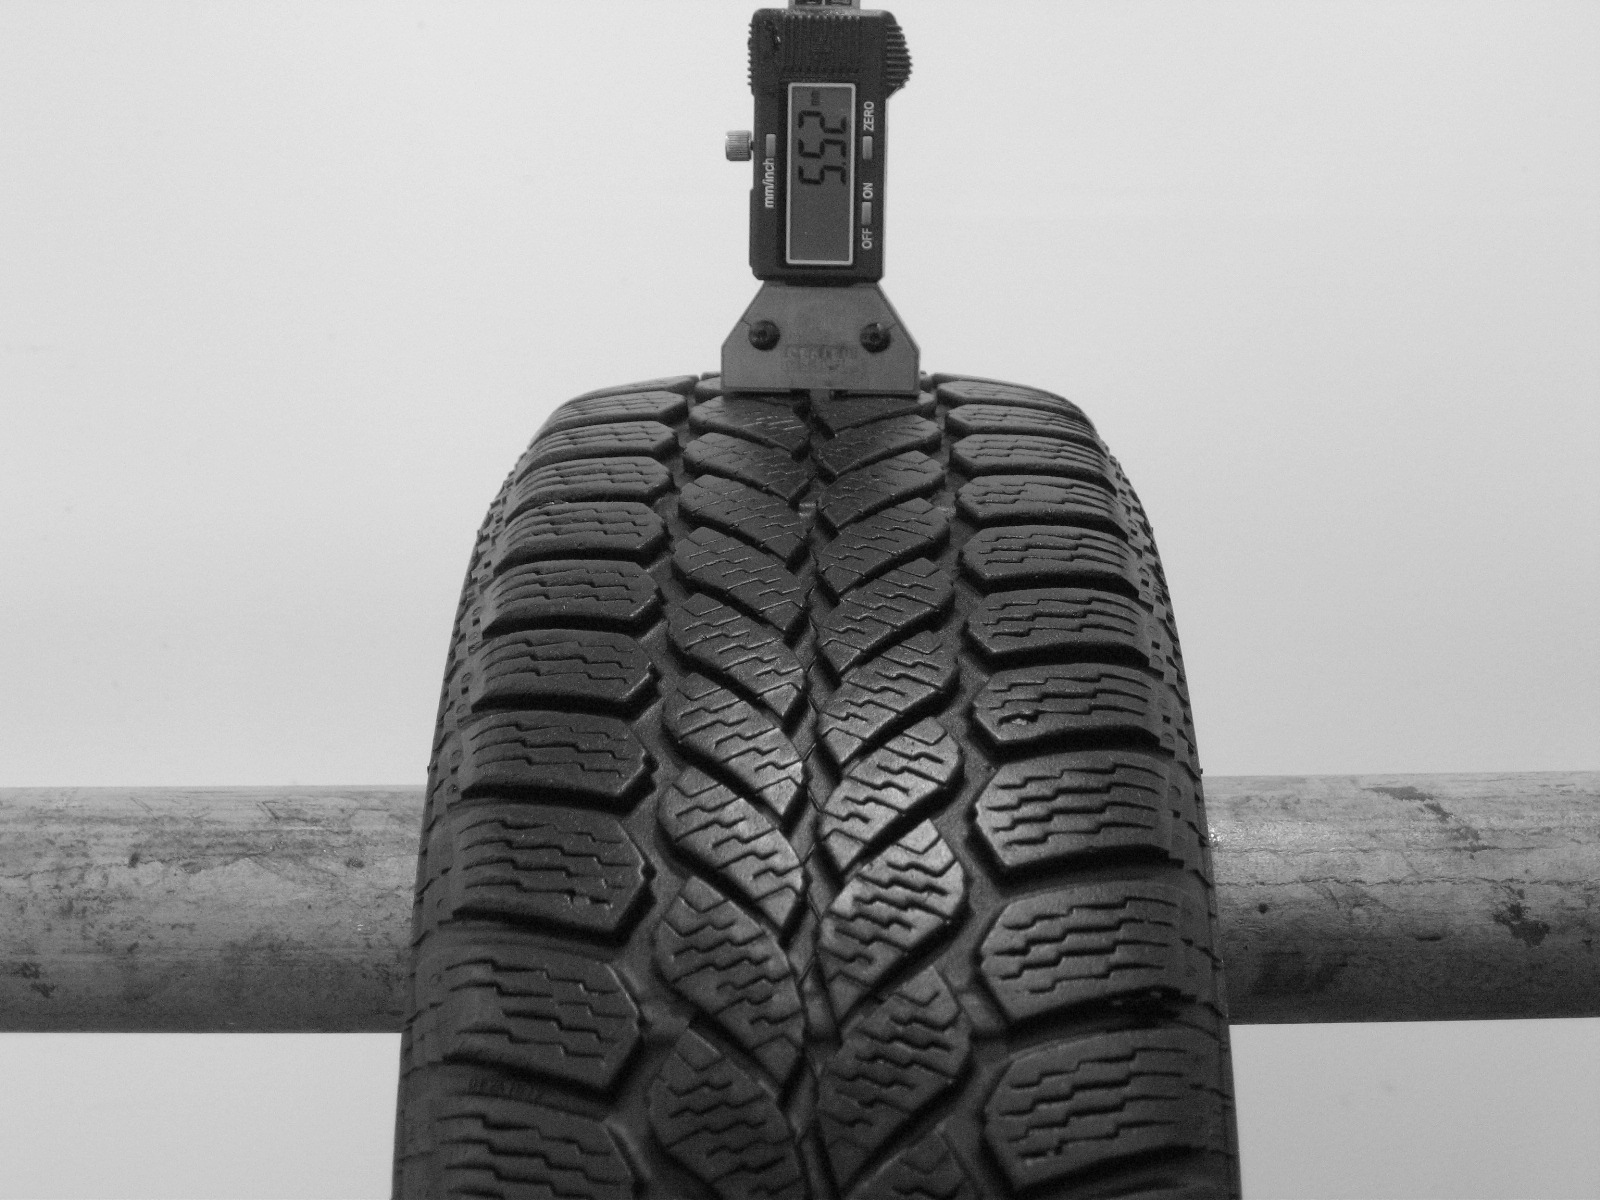 Použité-Pneu-Bazar - 155/65 R13 SEMPERIT WINTER GRIP-kusovka-rezerva 3mm